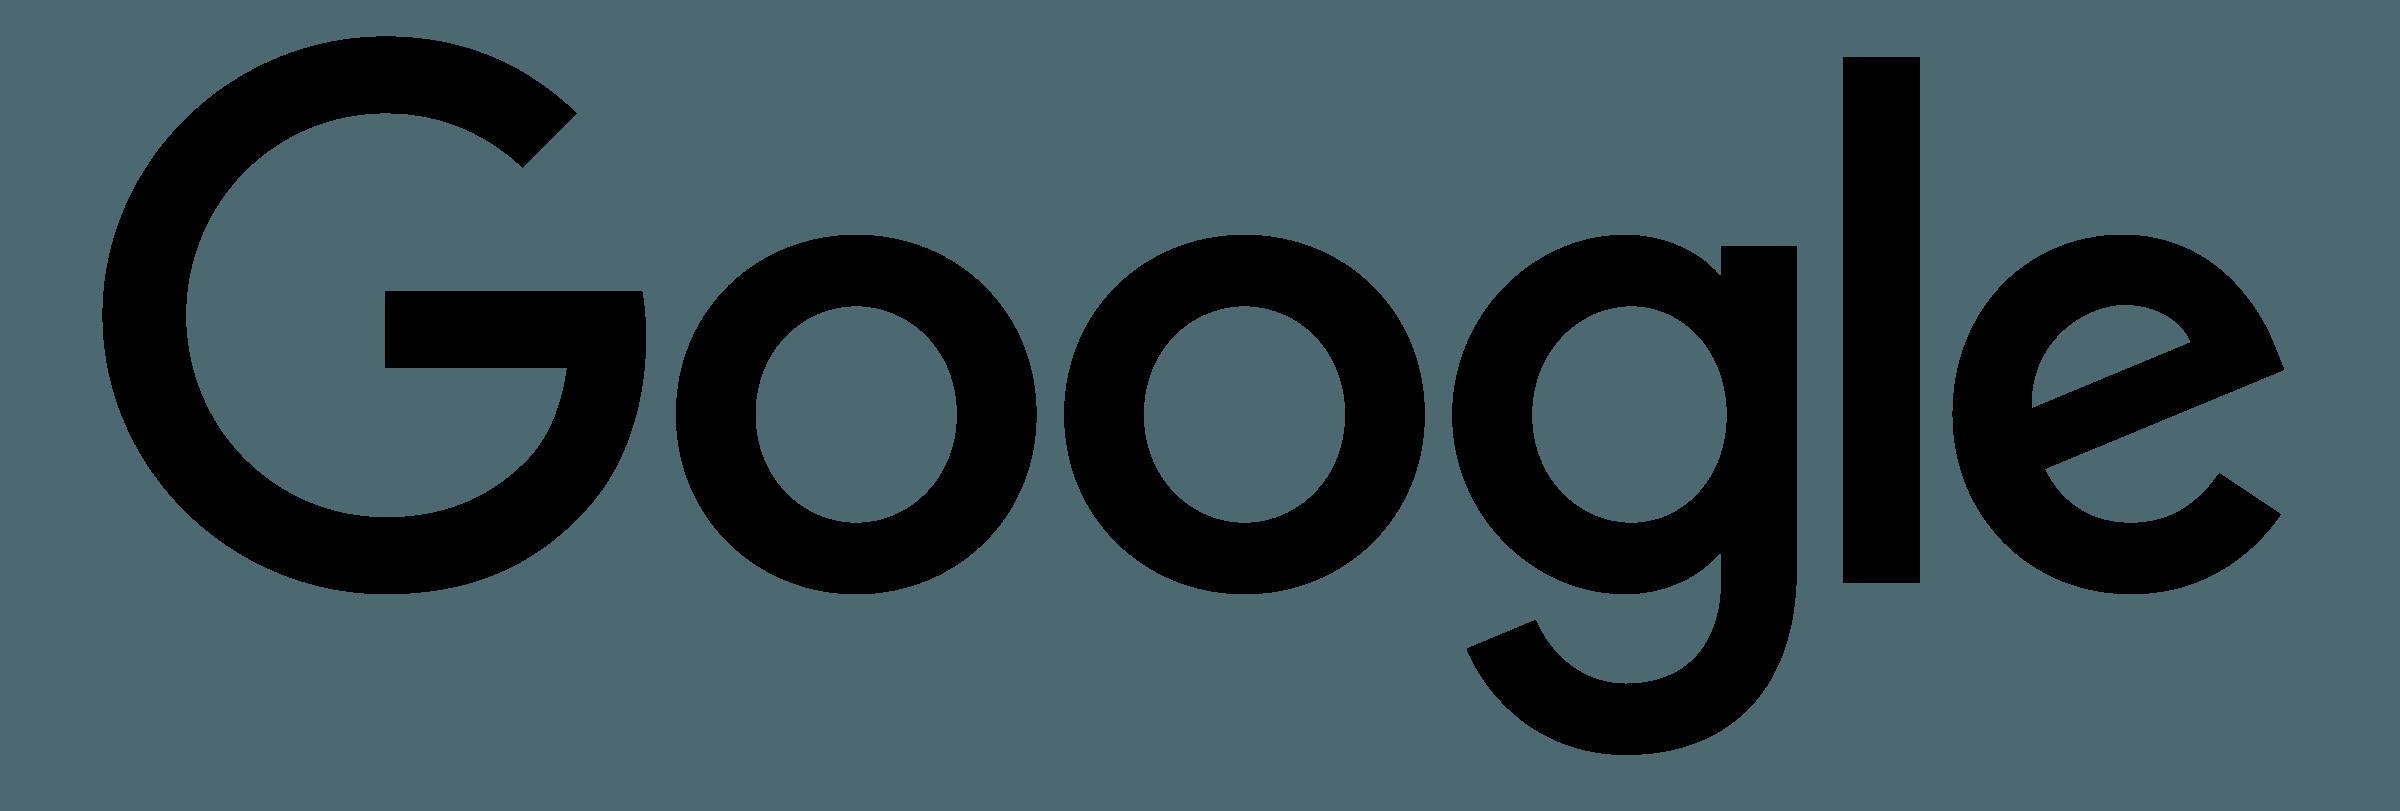 2400x811 Google Transparent